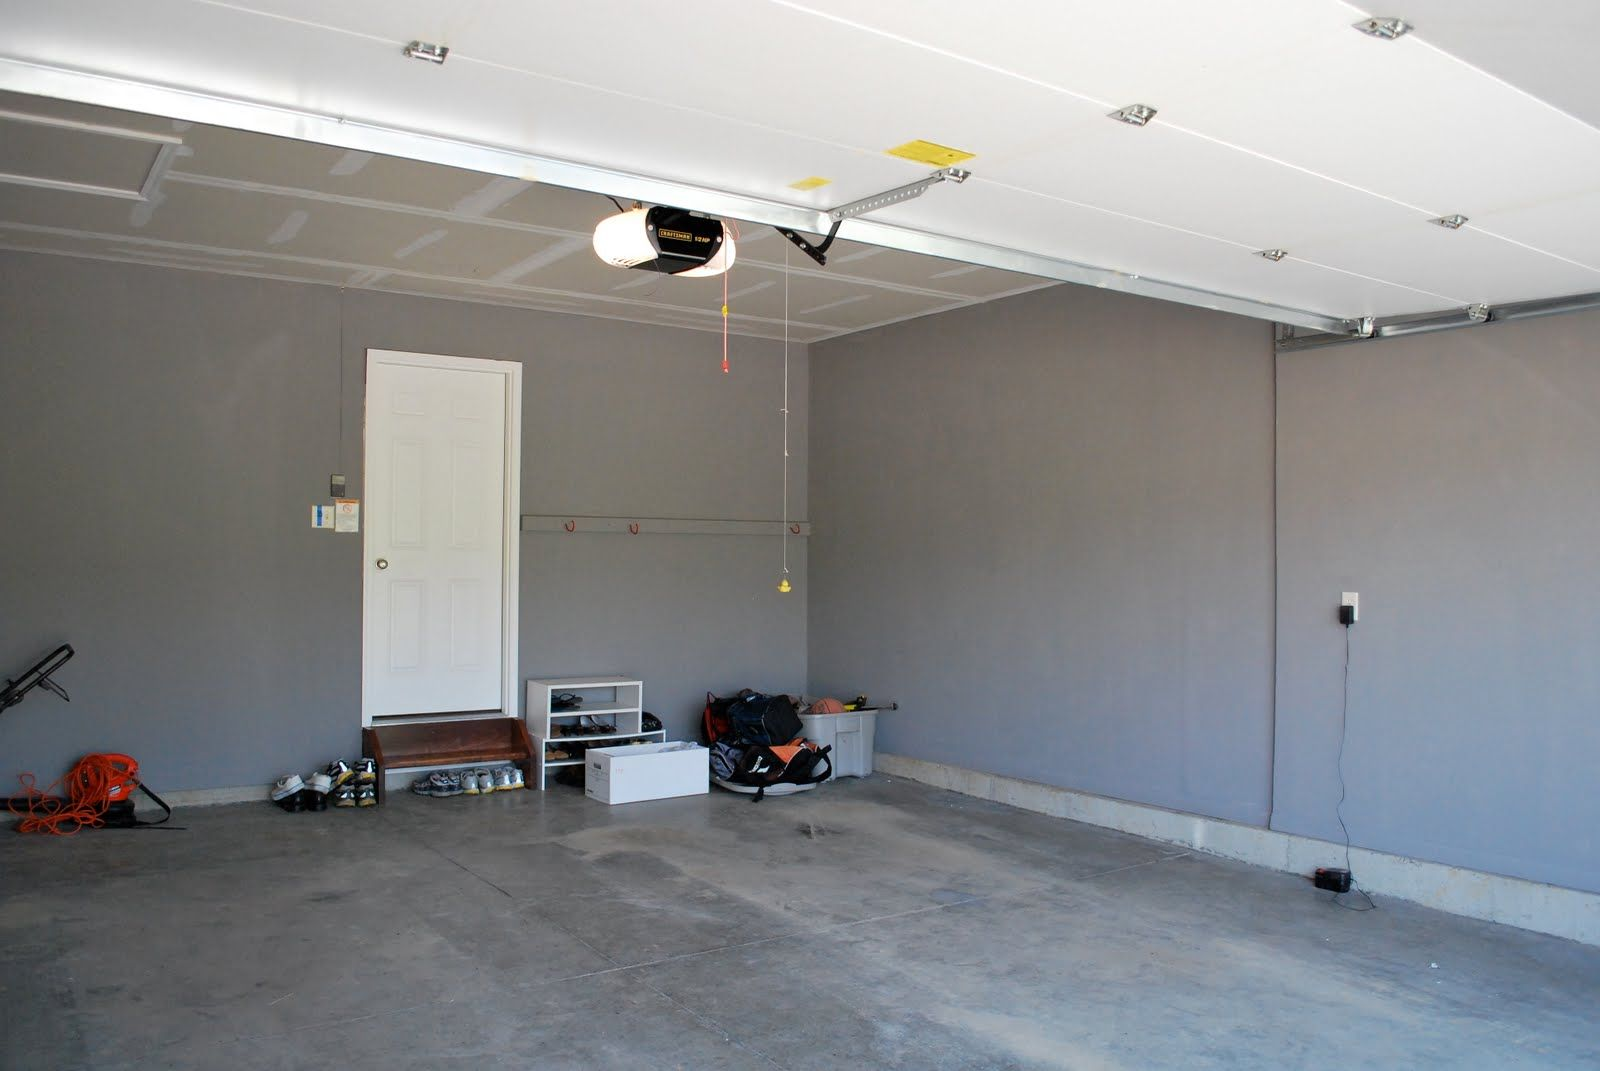 Easy Garage Paint Schemes Ideas Painted Garage Walls Garage Paint Colors Garage Interior Paint